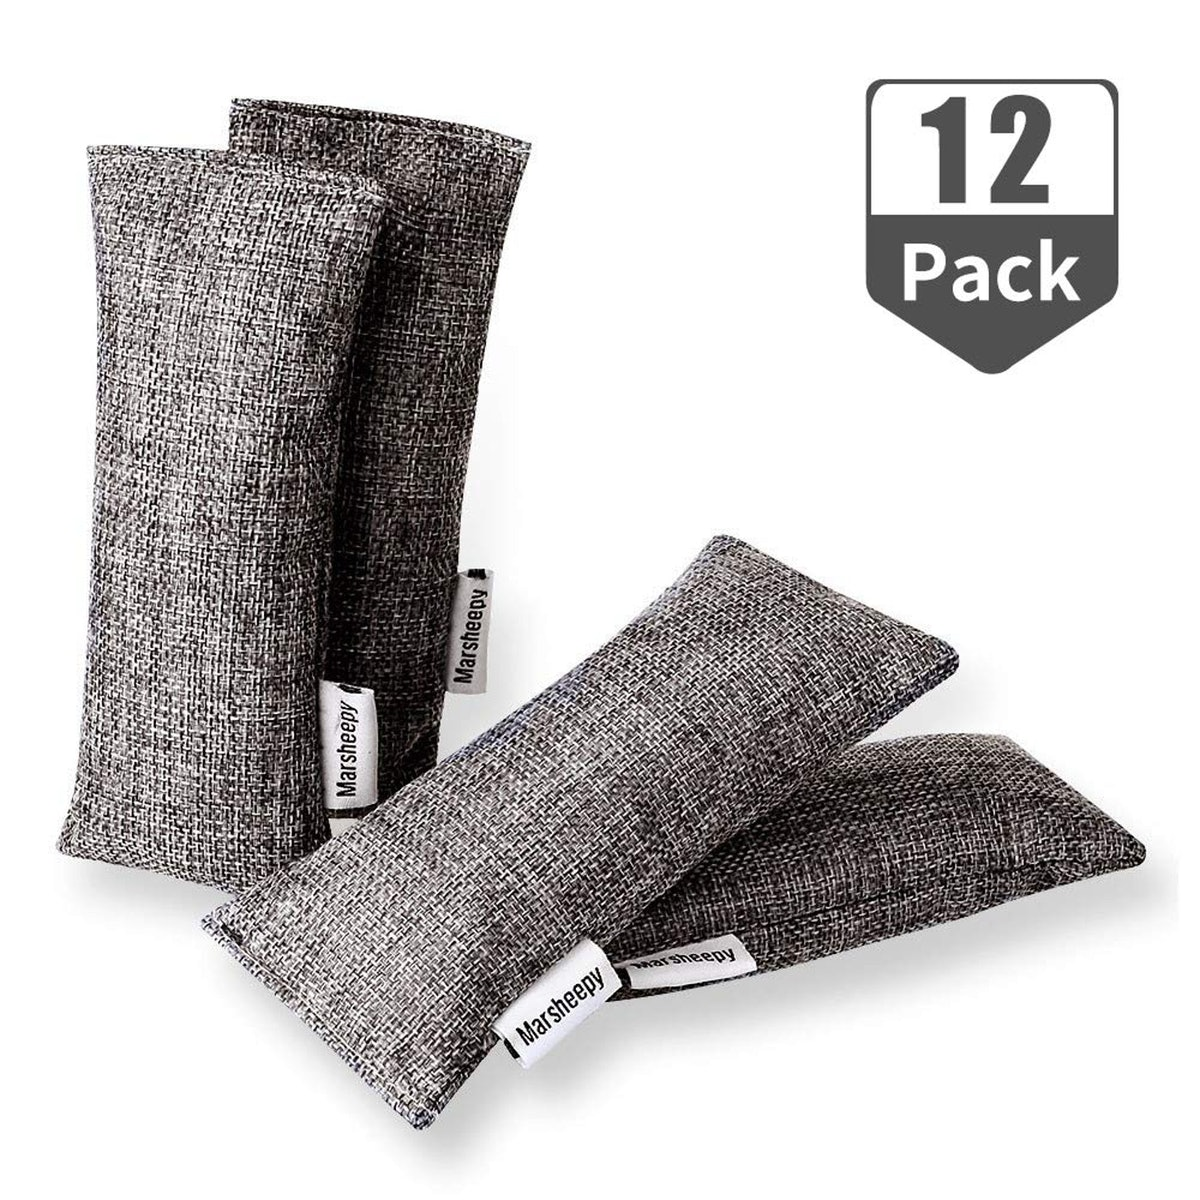 Marsheepy Air Purifying Bags (12-Pack)